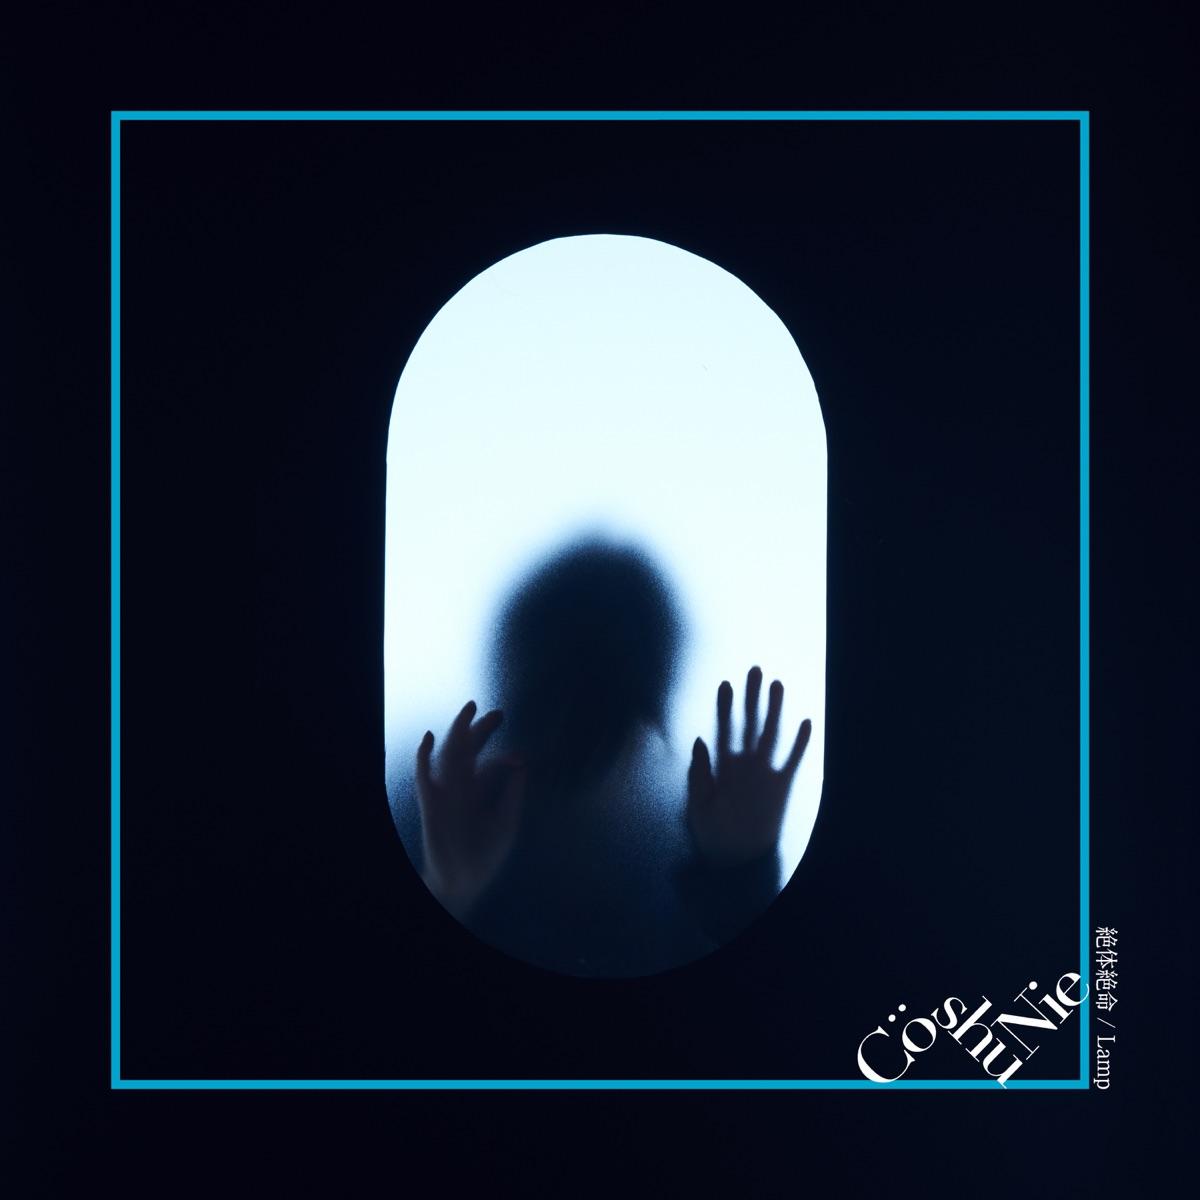 『Cö shu Nie - 絶体絶命』収録の『絶体絶命 / Lamp』ジャケット